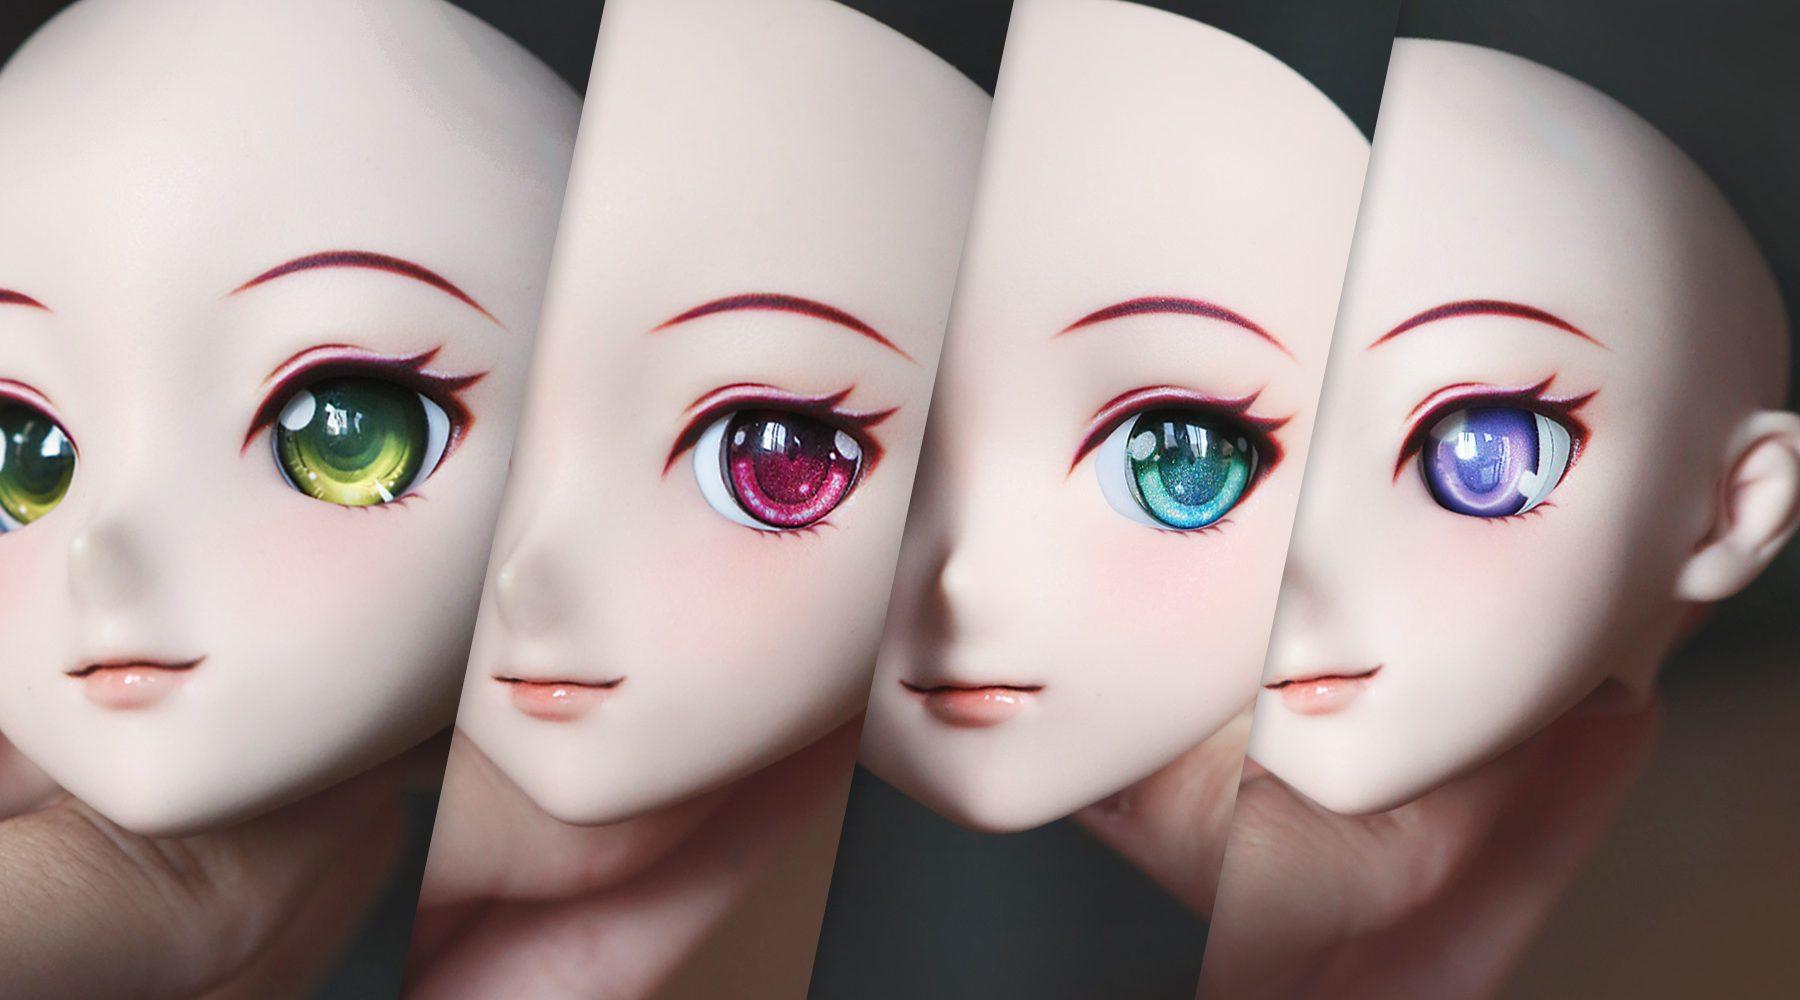 Dollfie Dream eyes